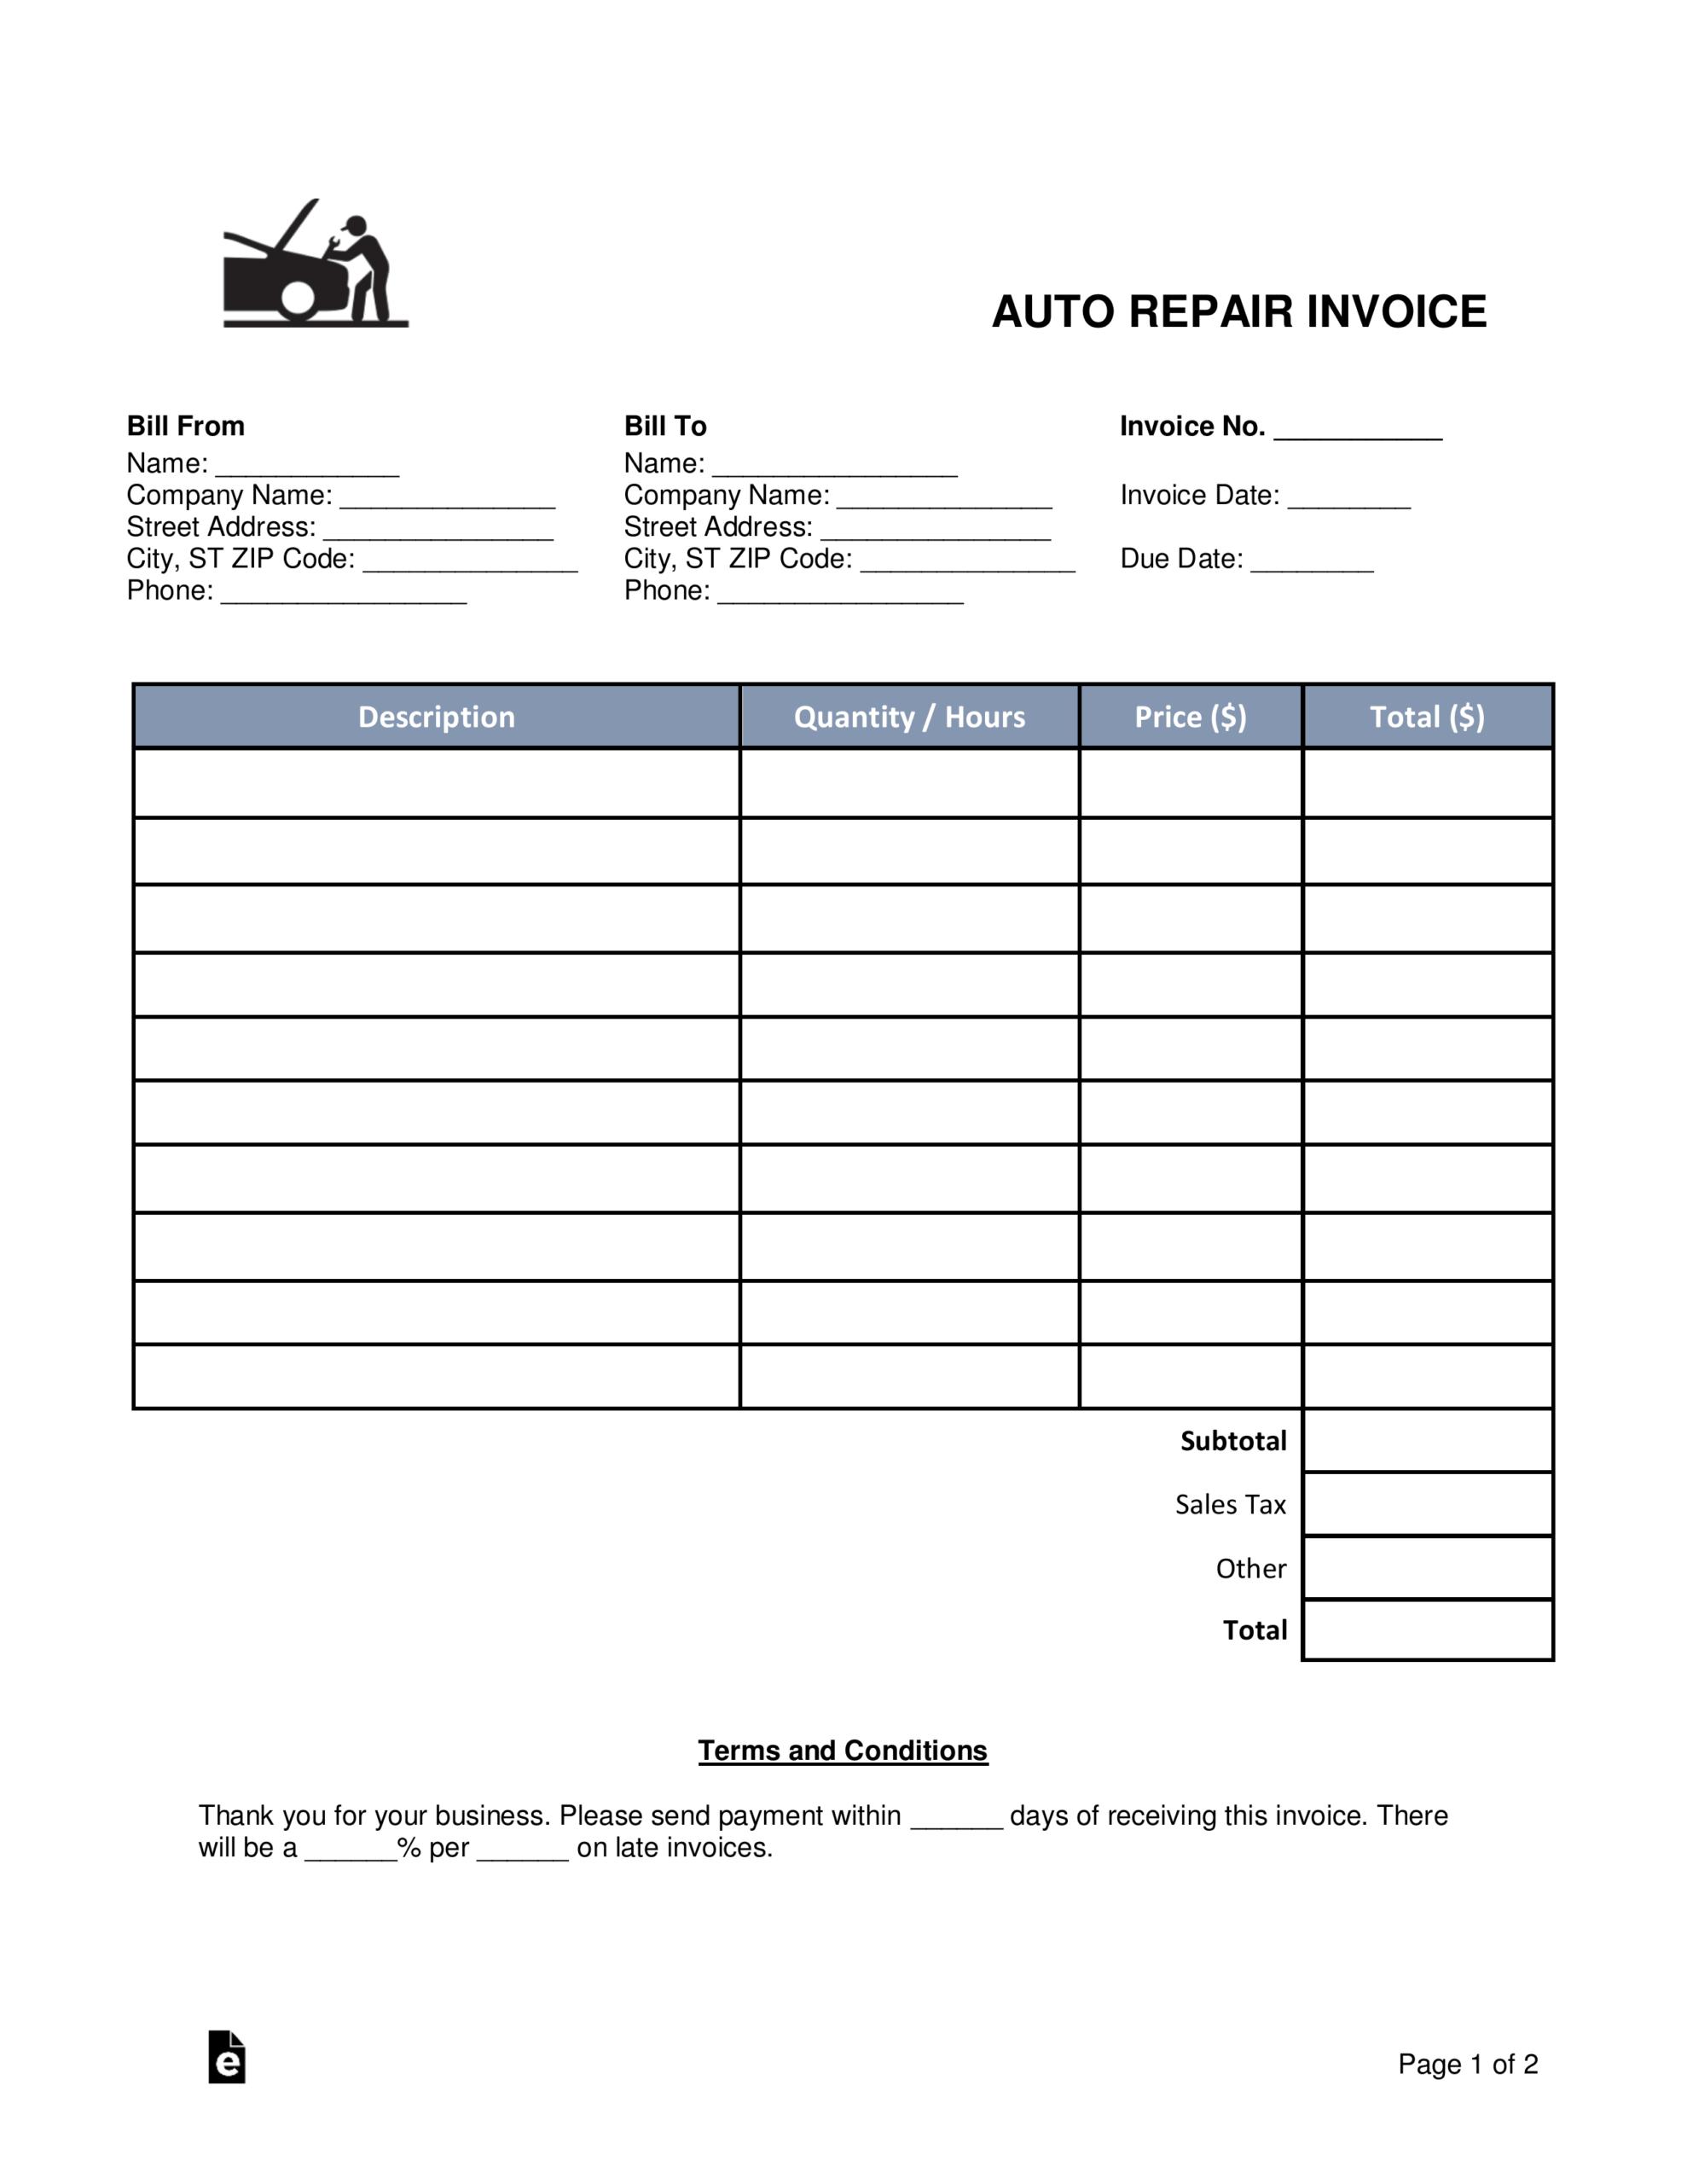 012 Template Ideas Auto Repair Invoice Word Car Remarkable Intended For Auto Repair Invoice Template Word